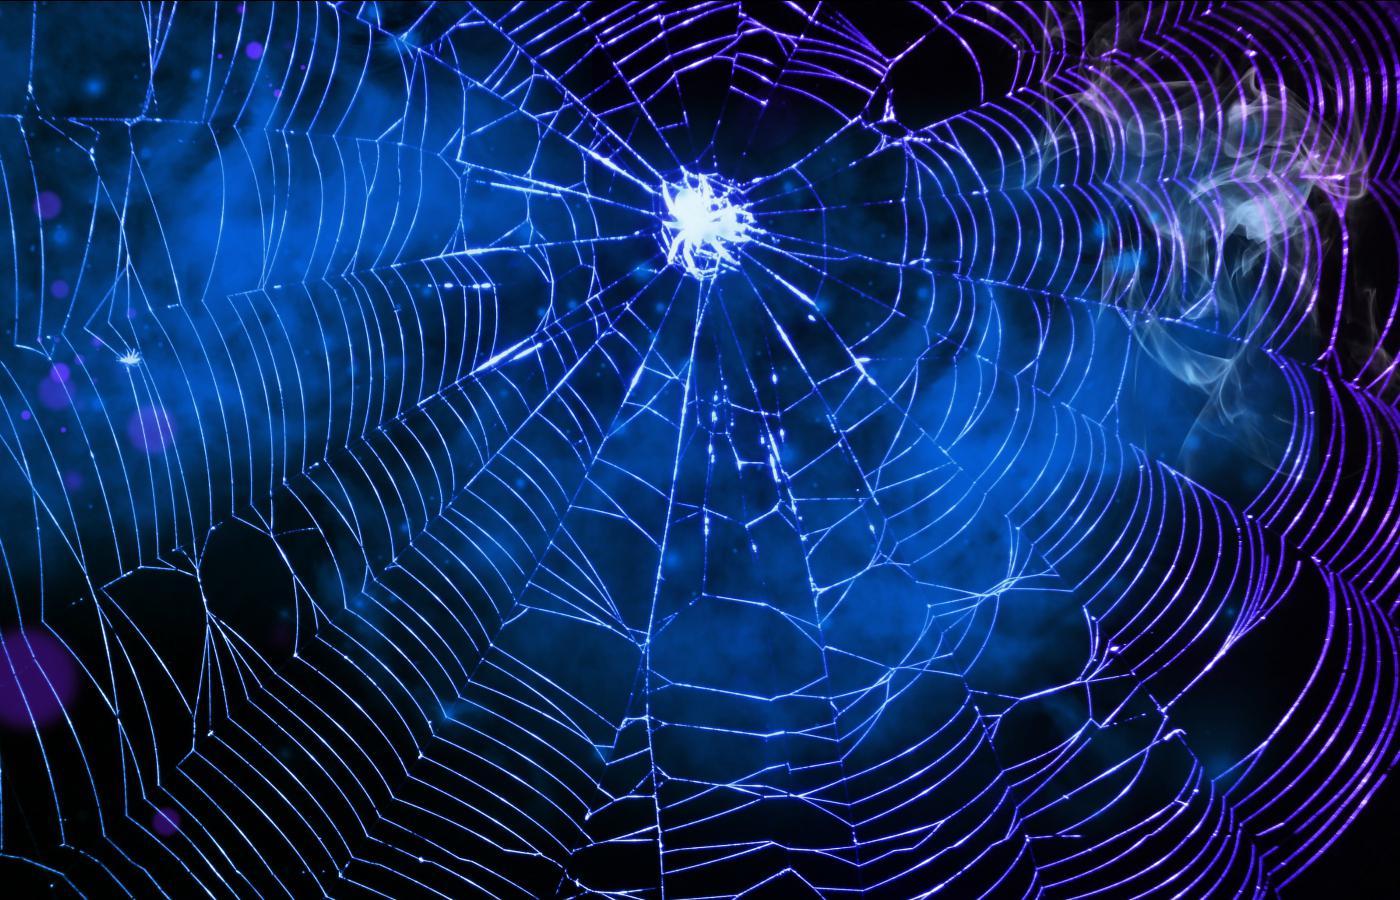 Spider Web Wallpaper 1400x900